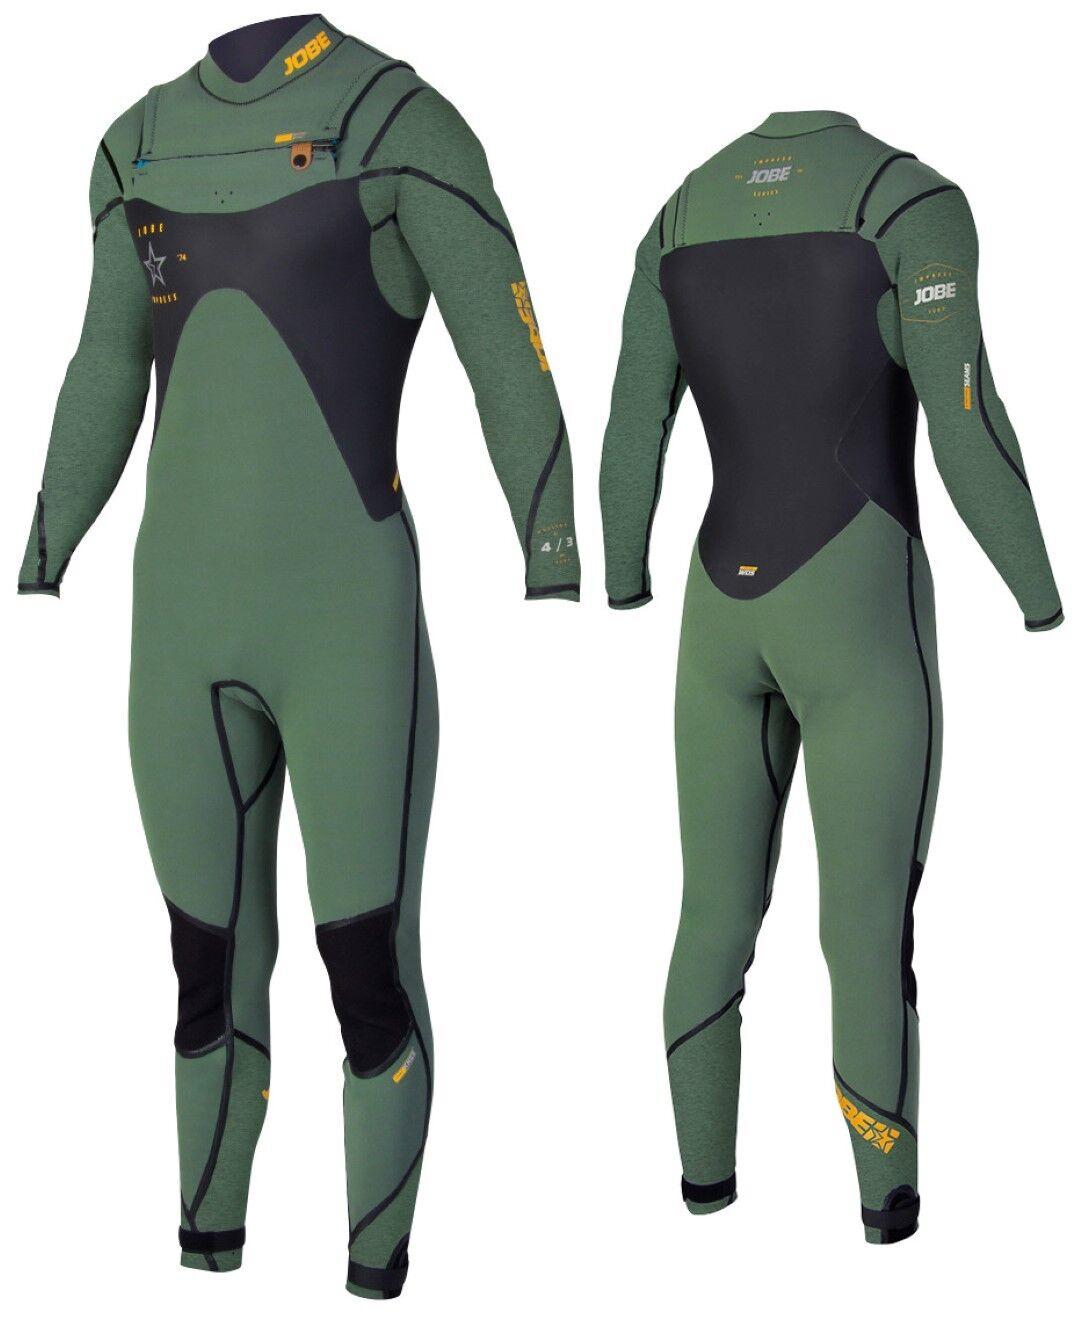 Jobe Impress TEMP Zip Zip Zip 4 3 Men Neoprenanzug Wakeboard Kite Surf Anzug G-7 M-N cd98a4